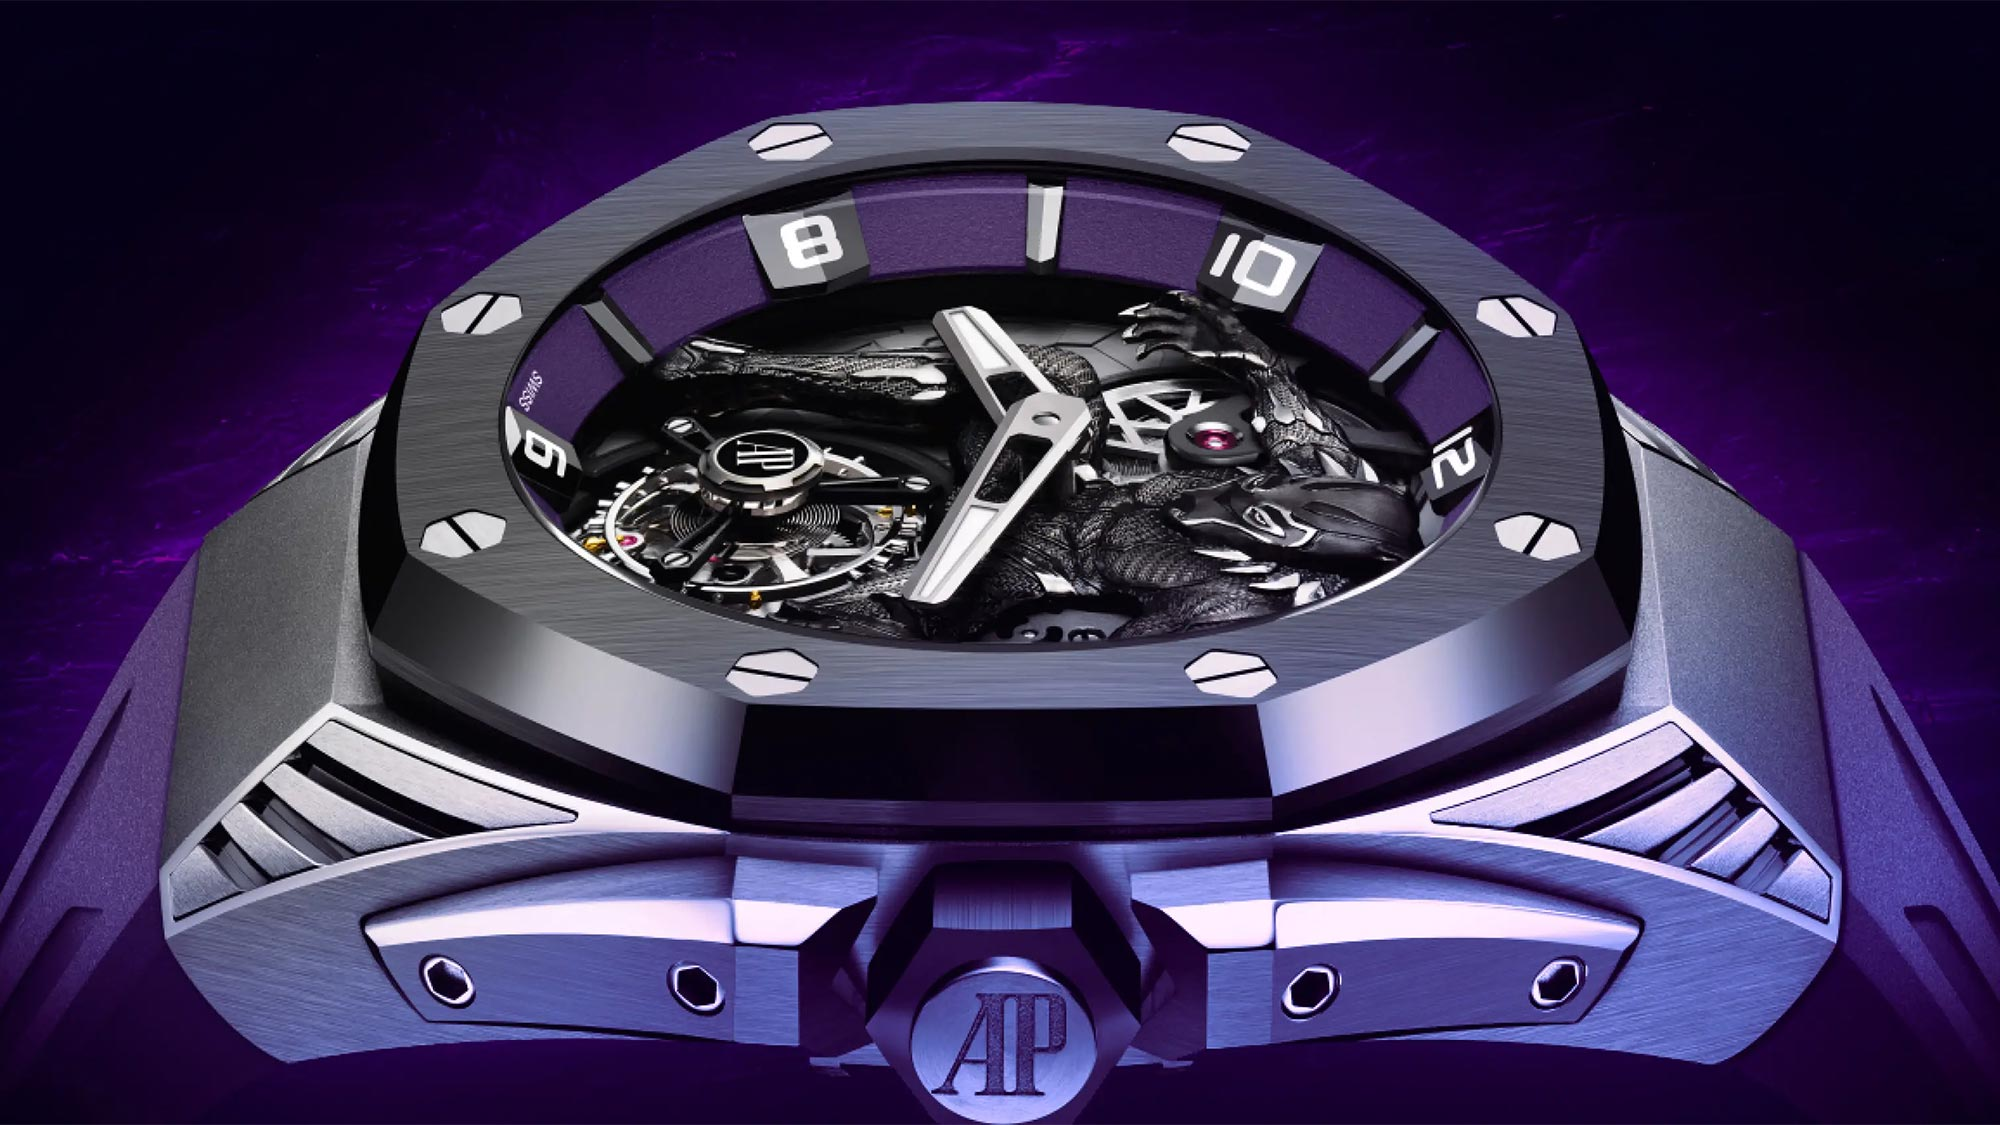 Audemars Piguet x Marvel Royal Oak Concept Black Panther Flying Tourbillon